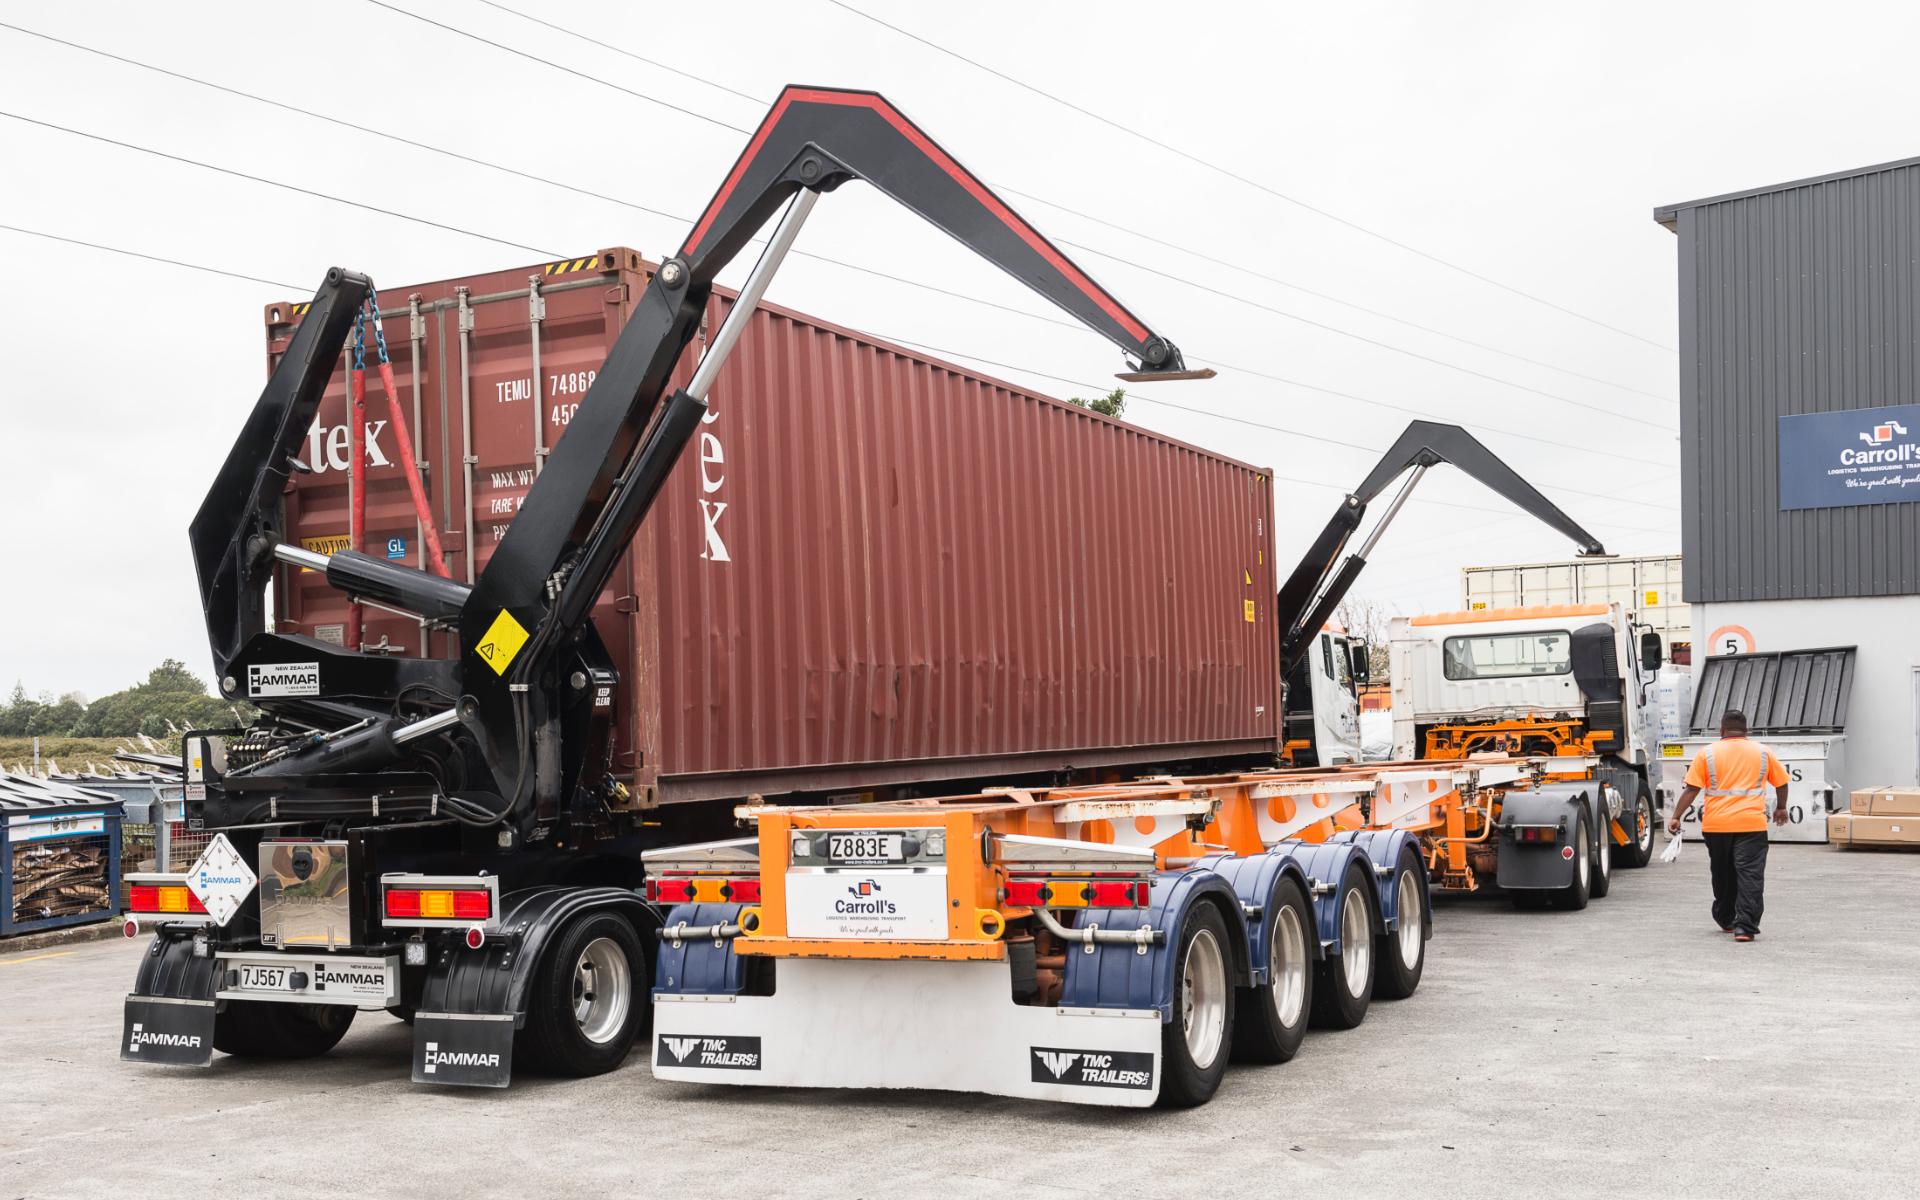 Carrolls_Crane-Truck_Heading